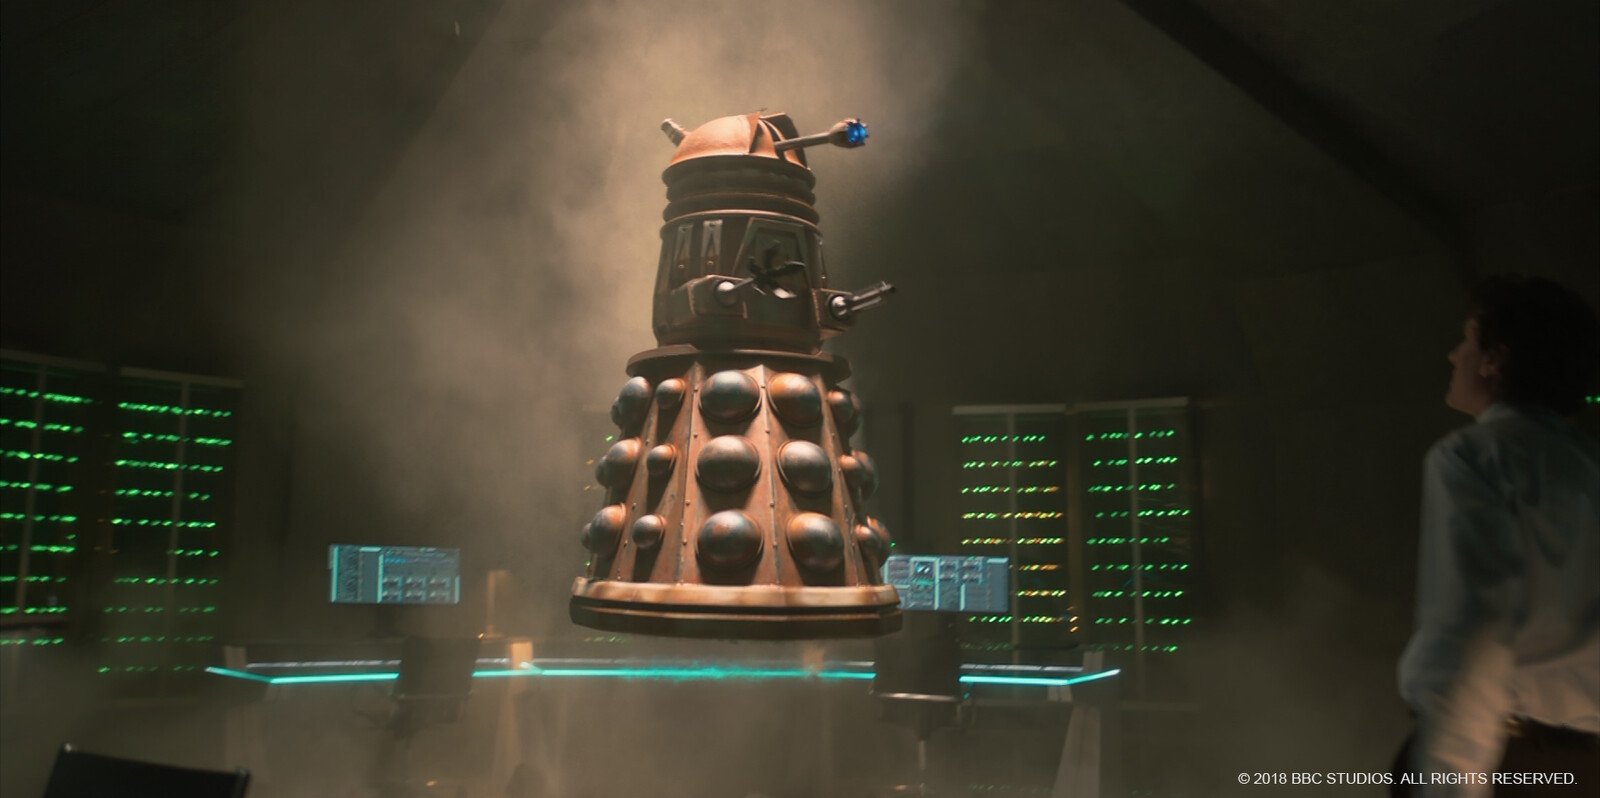 Dalek - texturing, shading and shot lighting